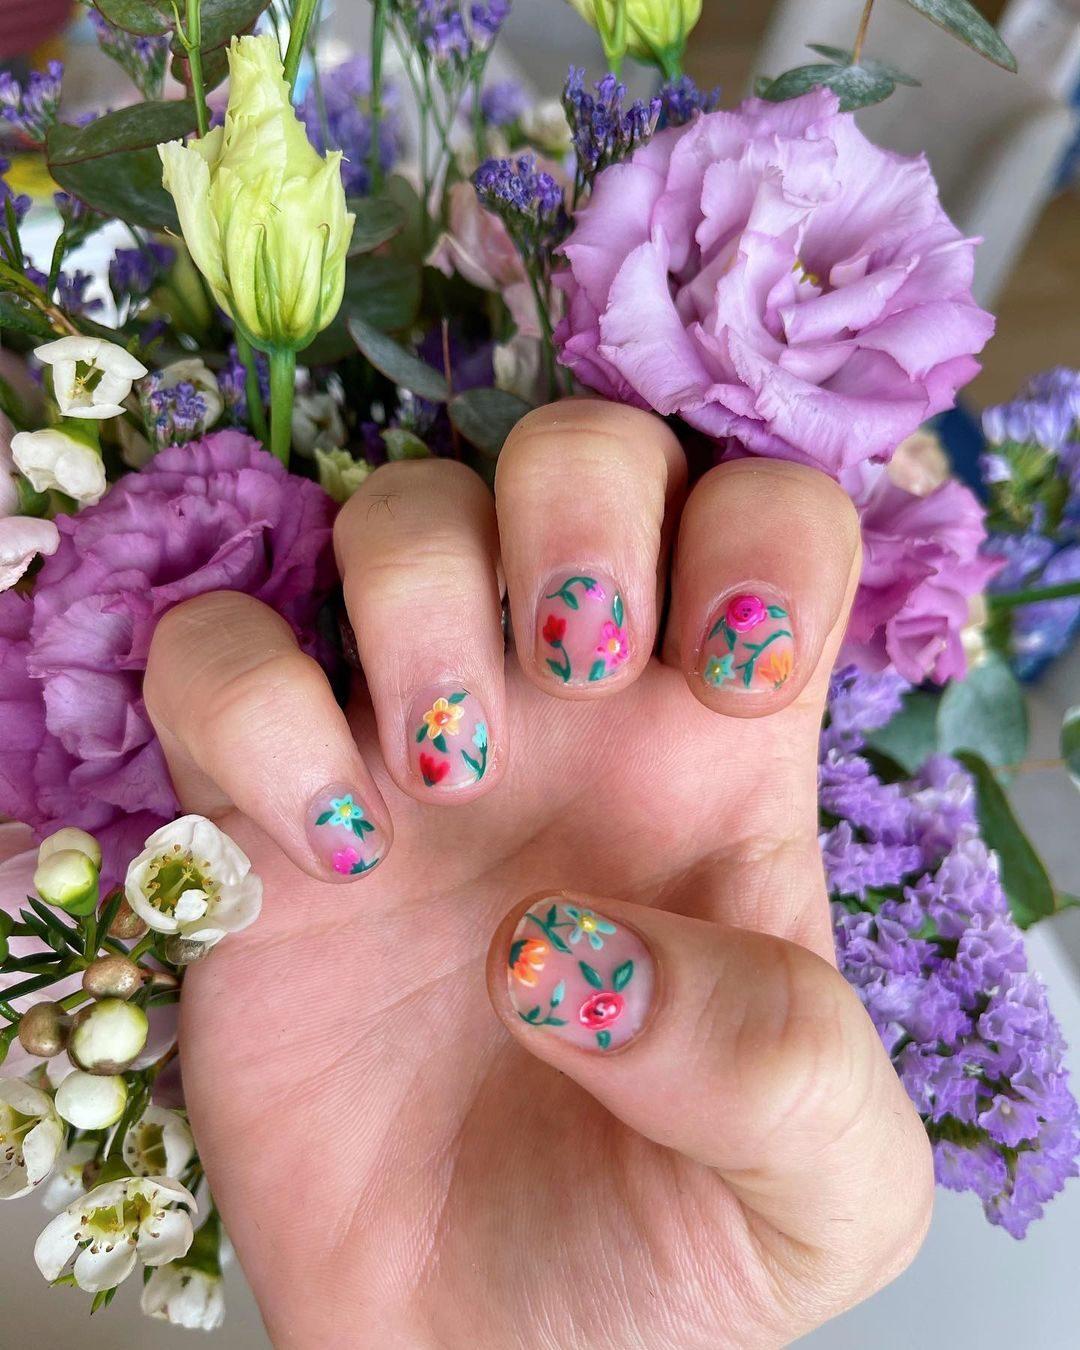 La nail art floreale sfoggiata da Fedez